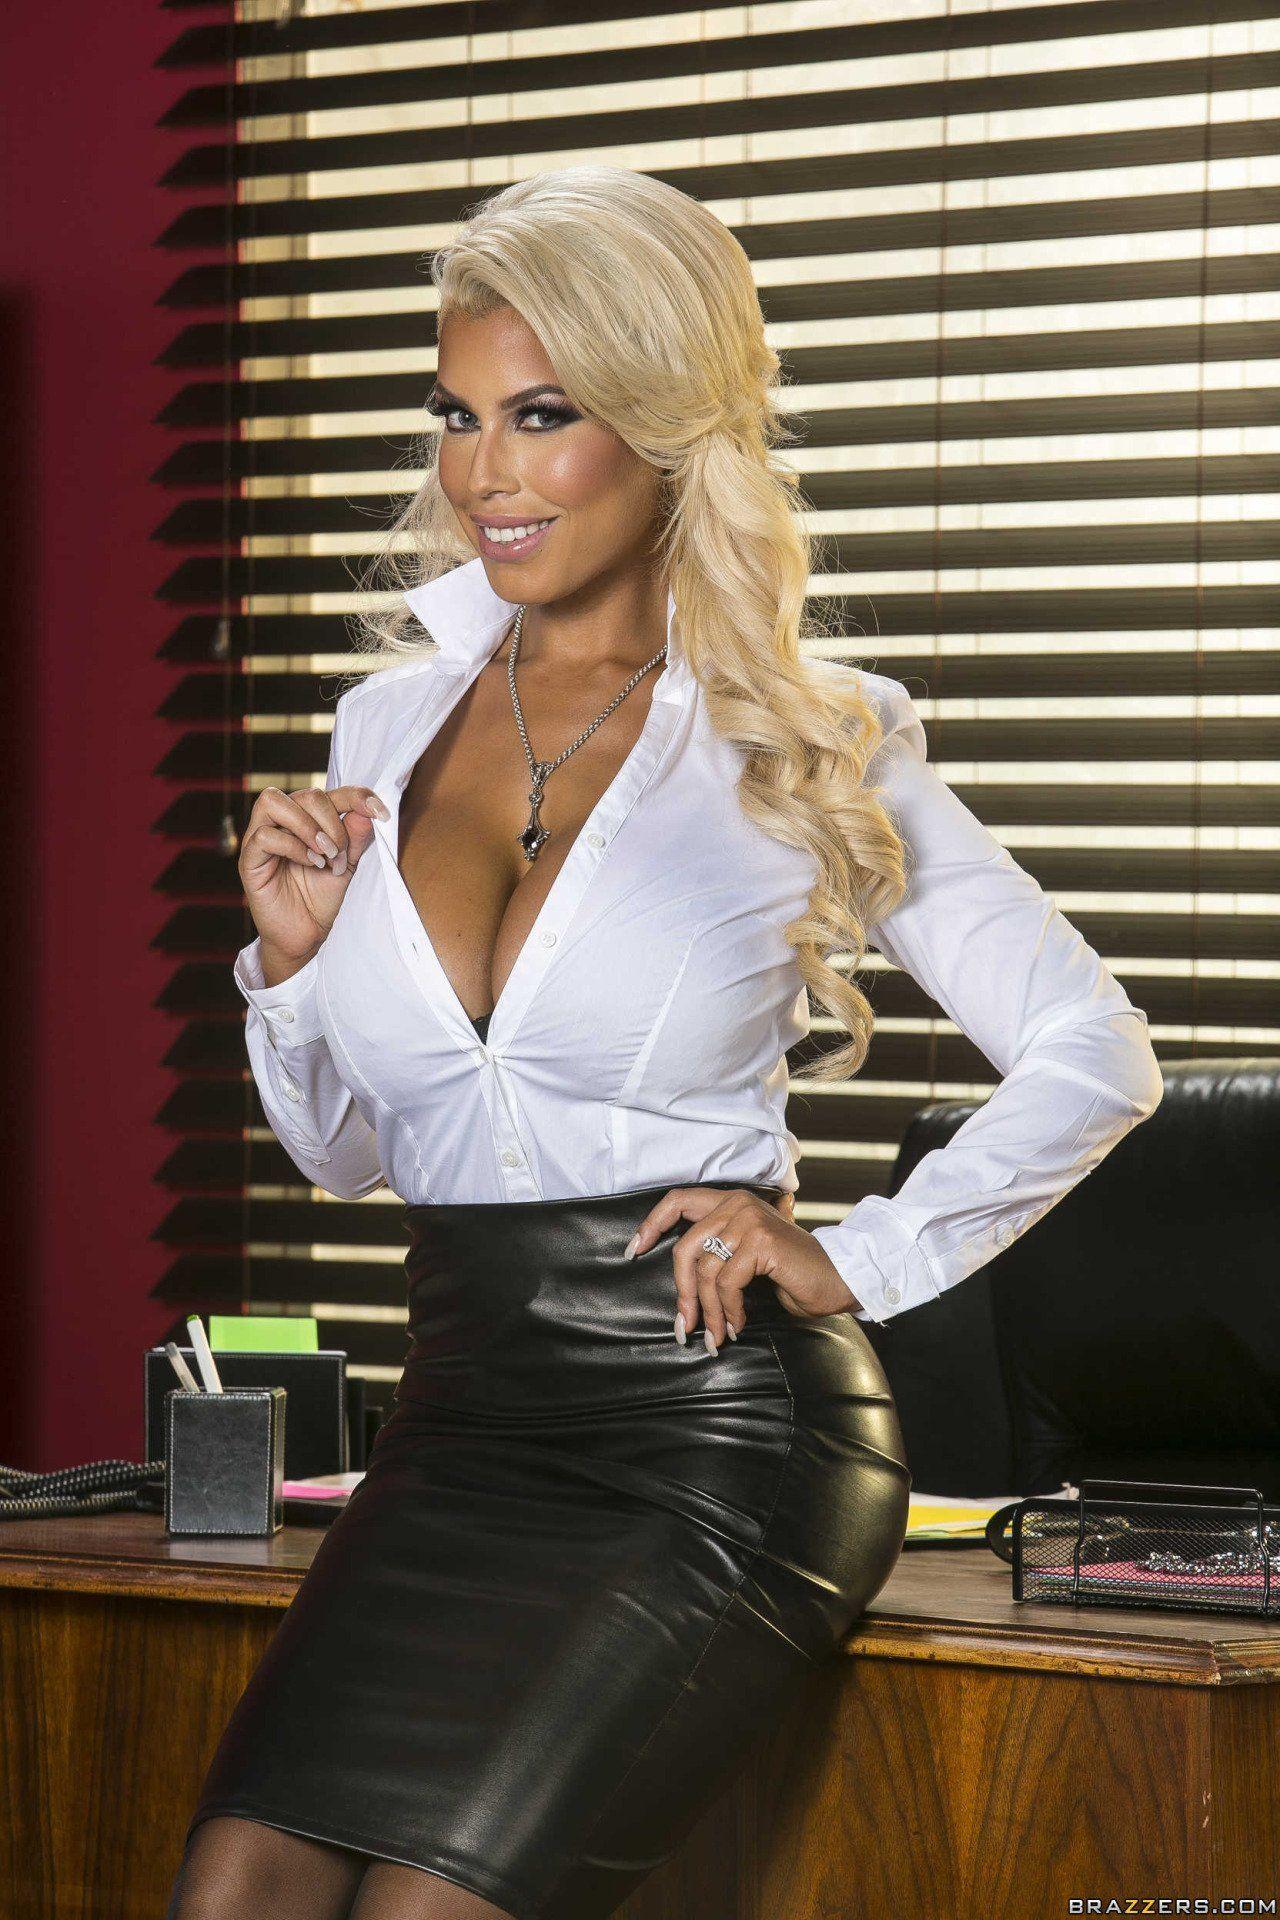 Big boobs tight blouse